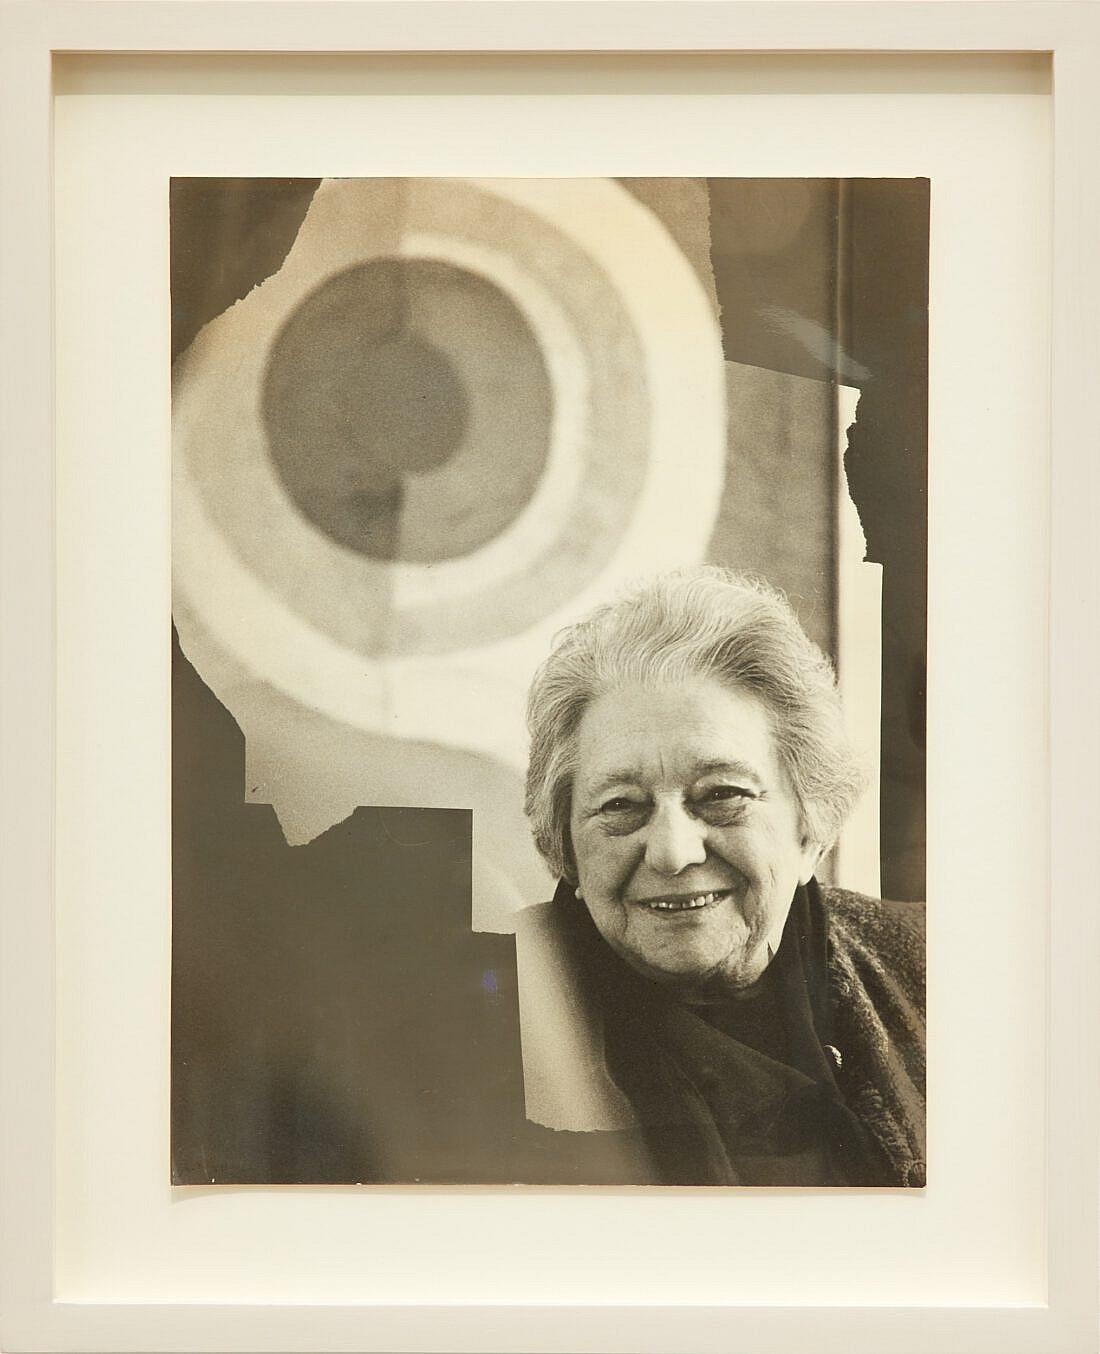 Andre Villers, Portrait de Sonia Delaunay